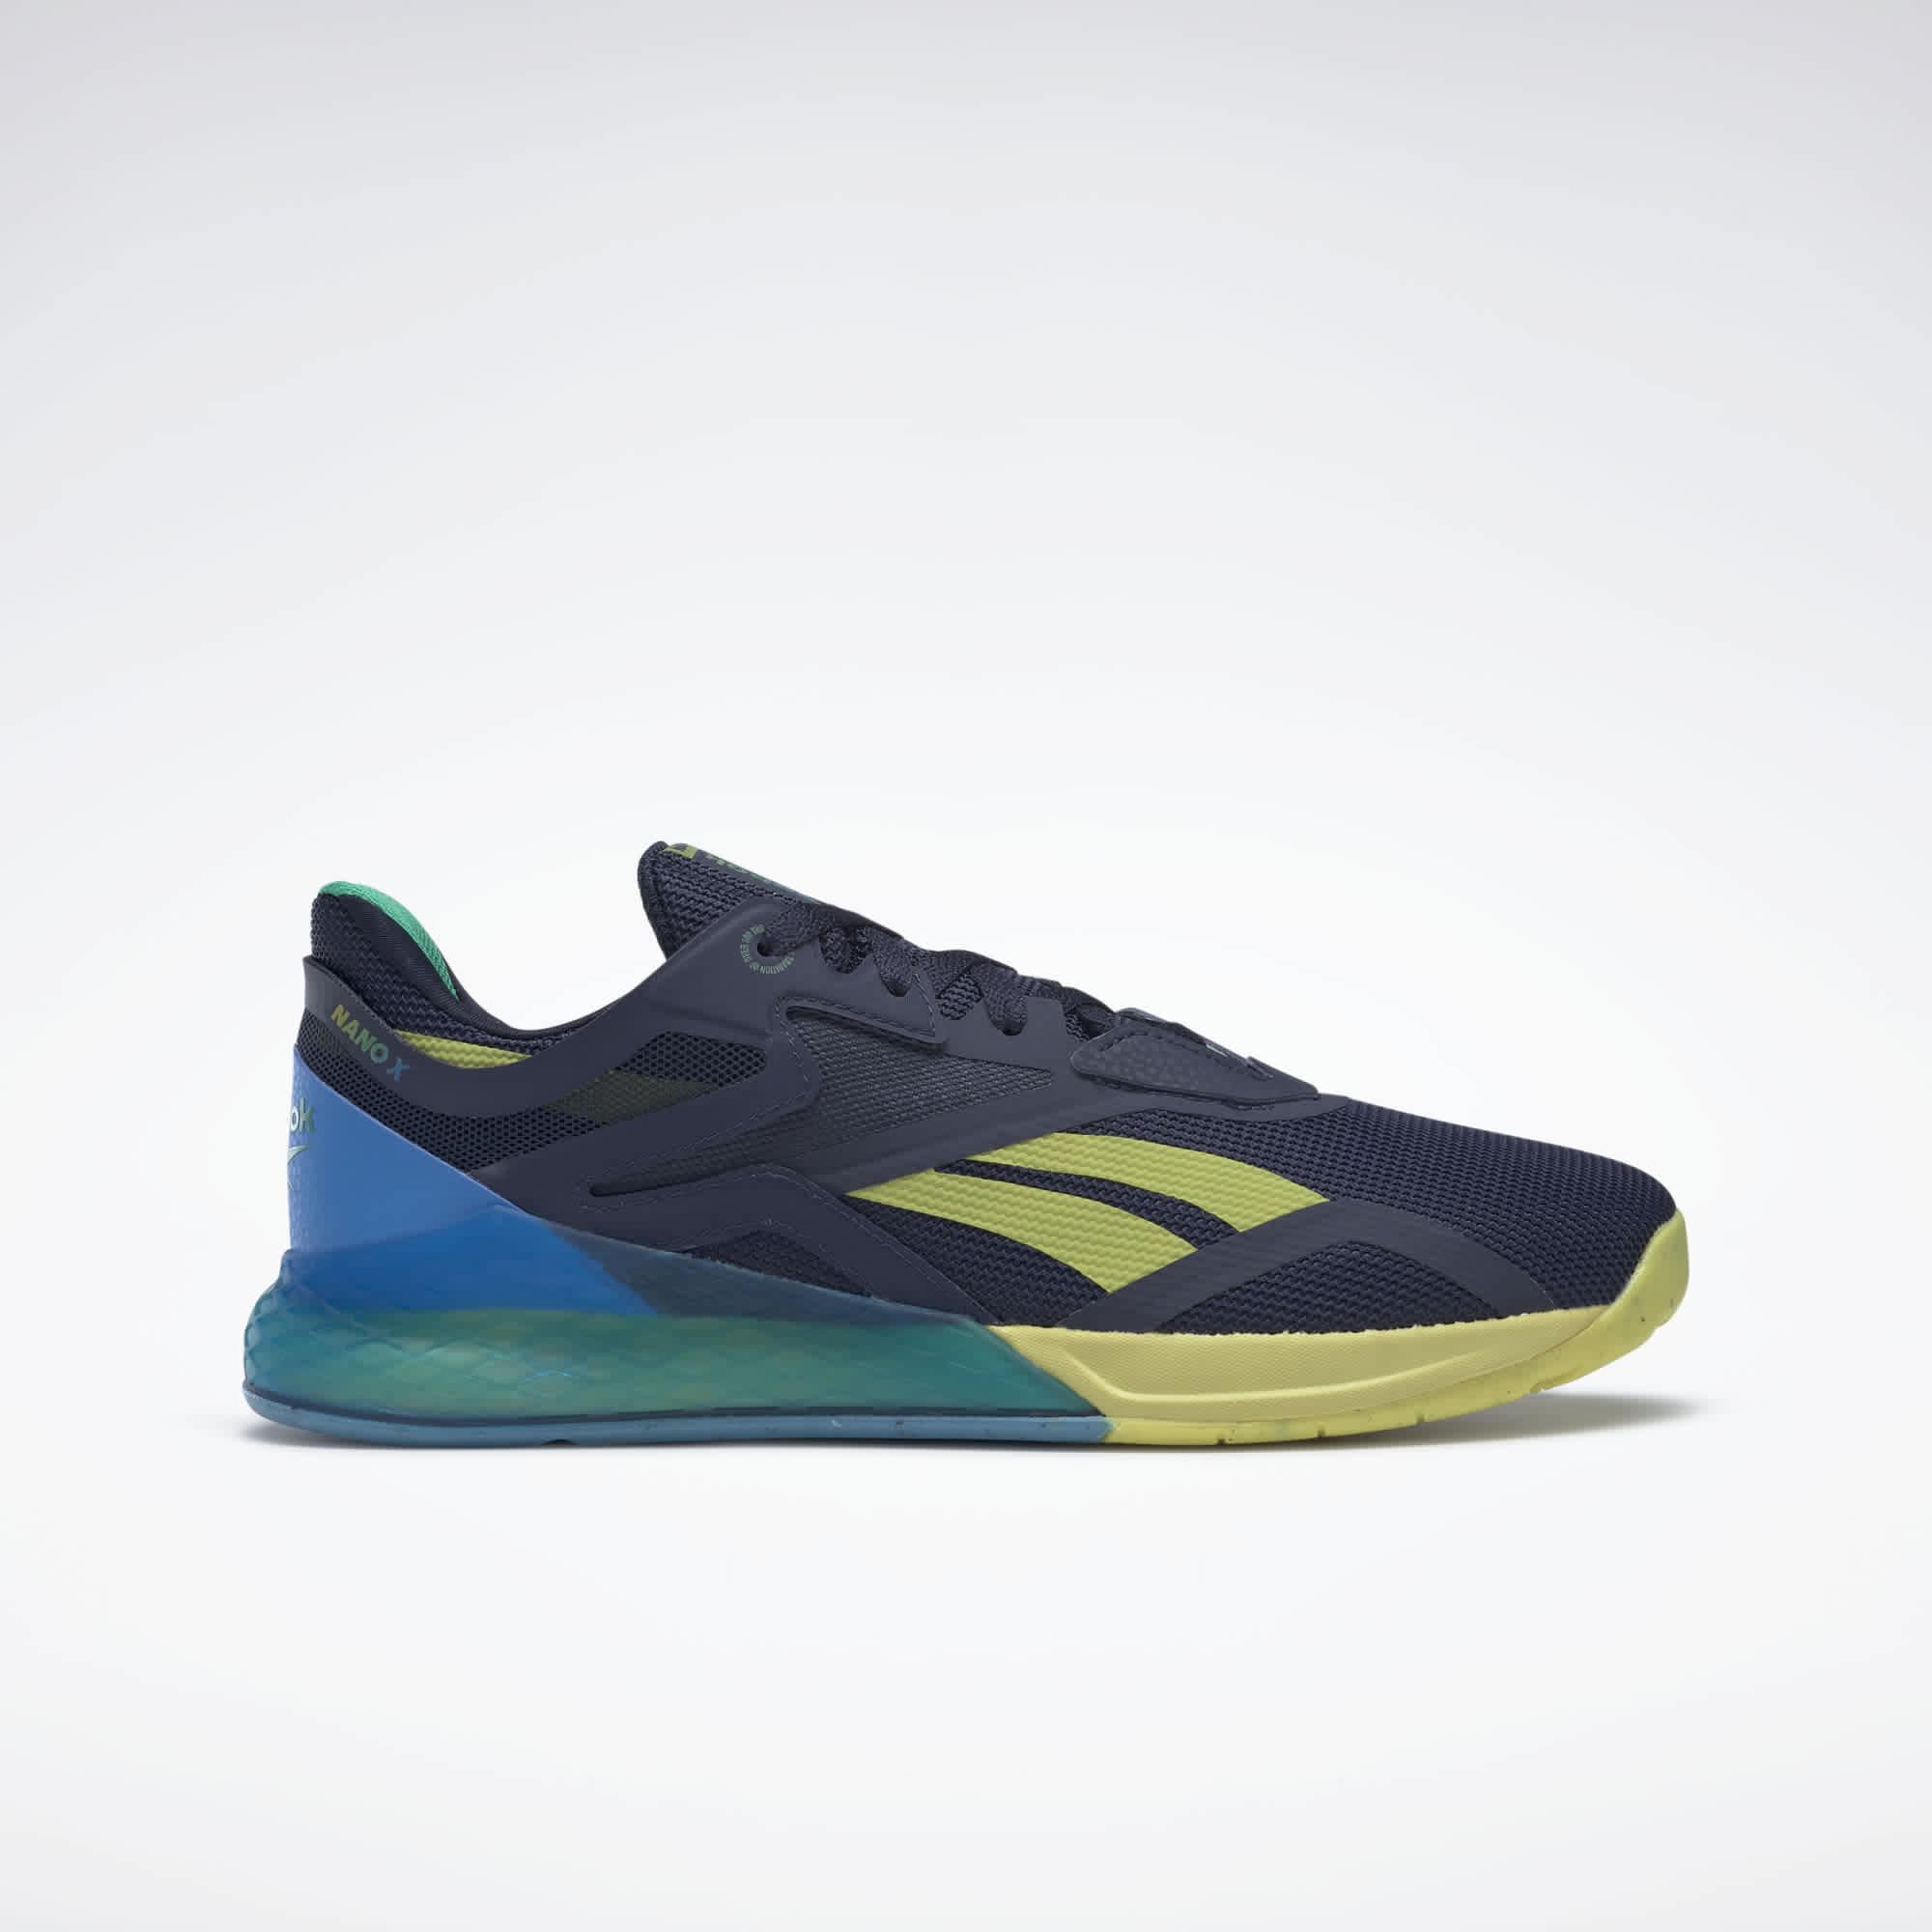 Reebok Men's / Women's Nano X ReeCycle Shoes